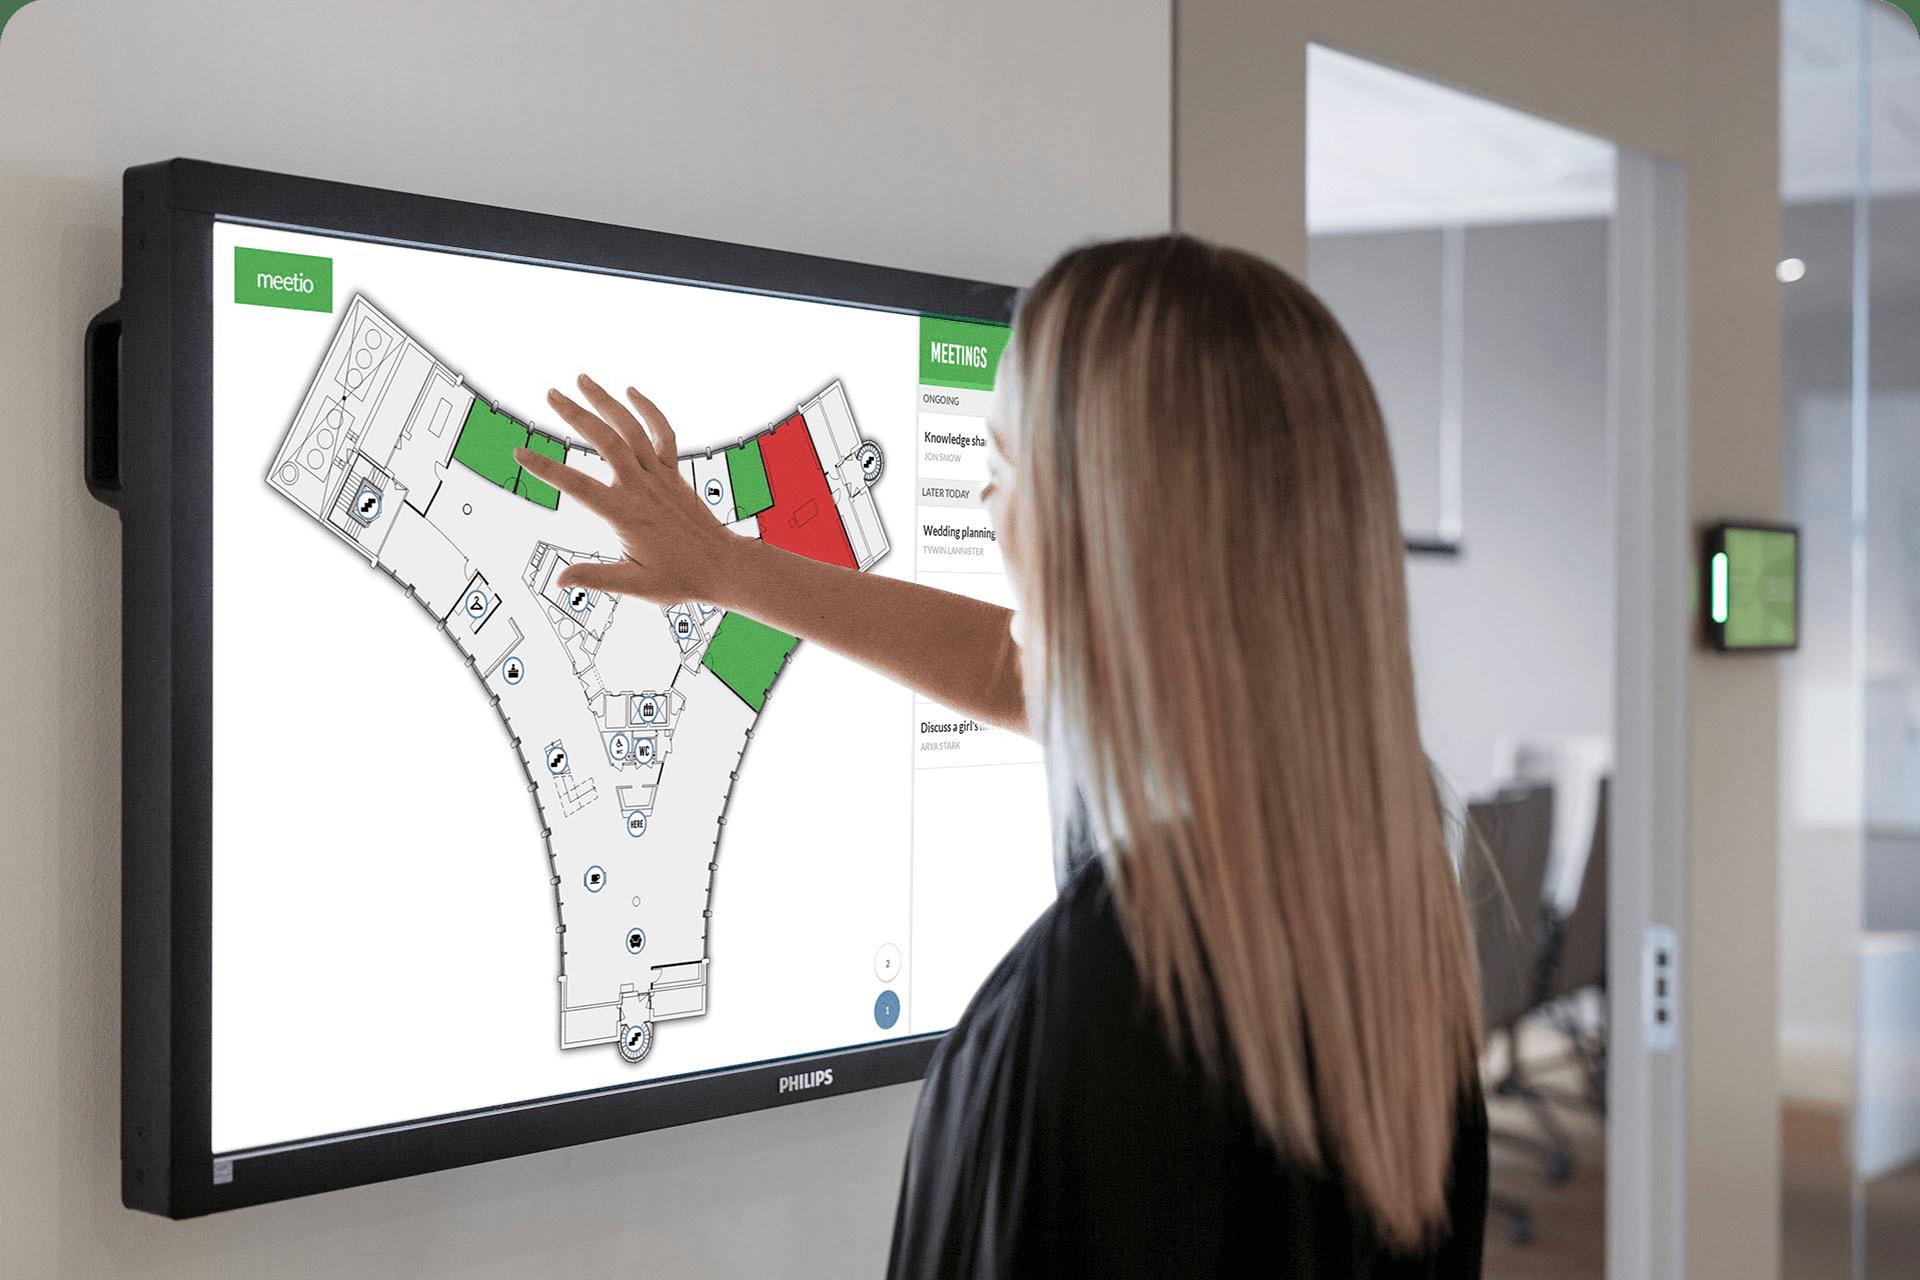 Office floor plan map on Meetio View screen